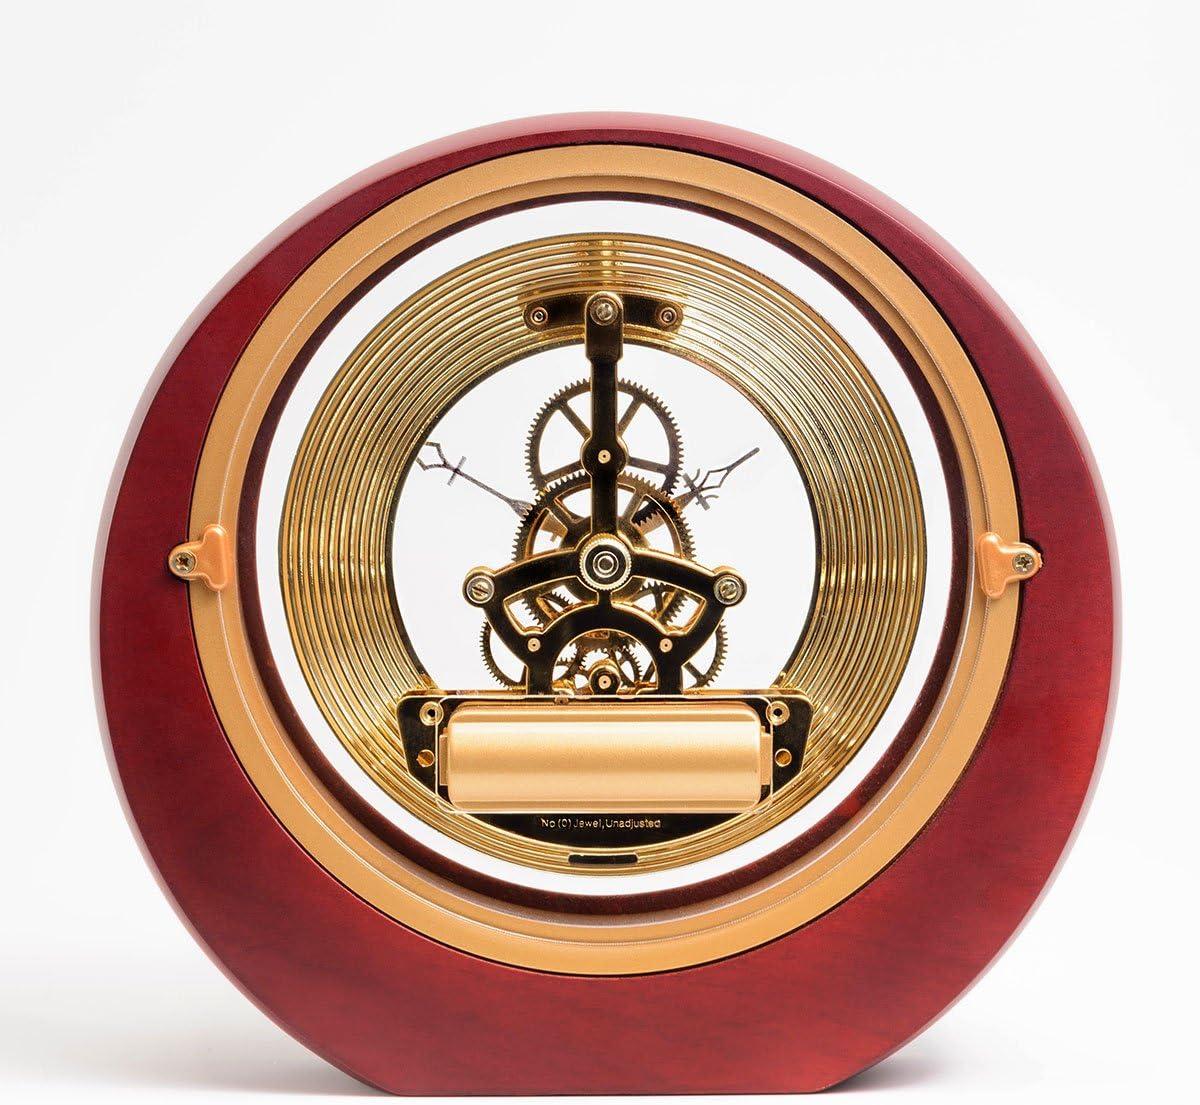 Dacasso Eclipse Burgundy Desk Clock, 8 x 7.25 x 2.50